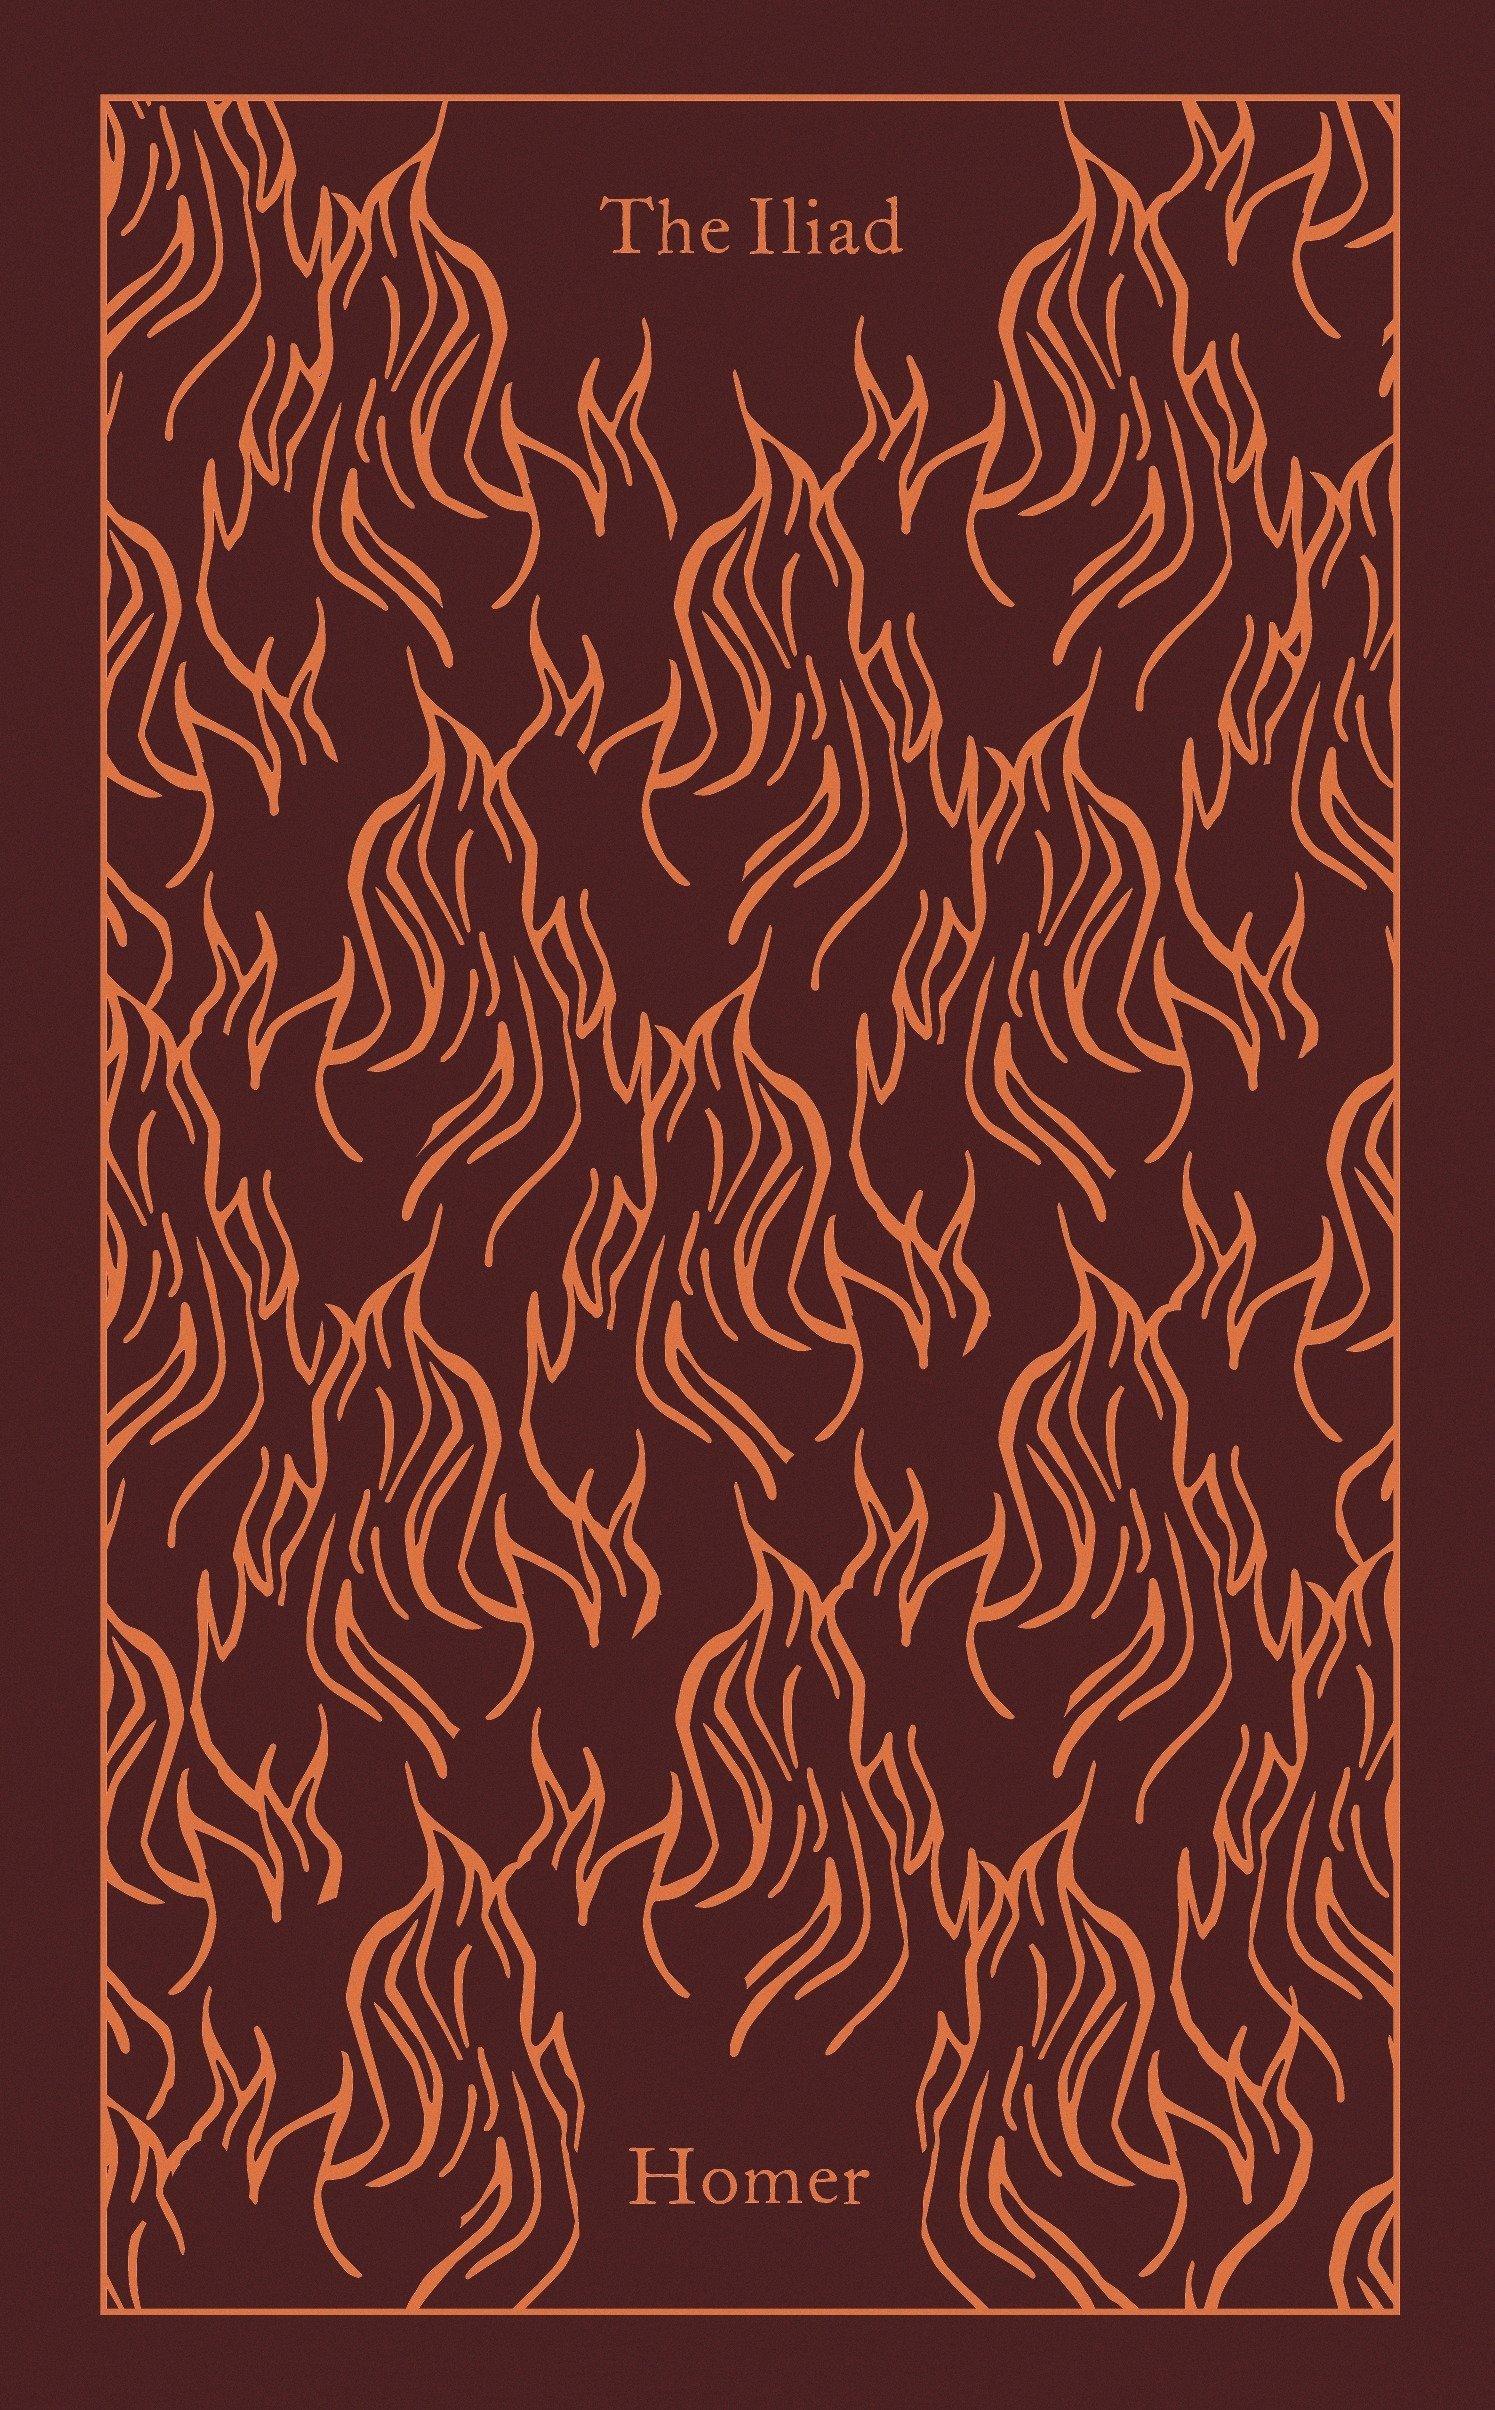 The Iliad (Penguin Clothbound Classics)